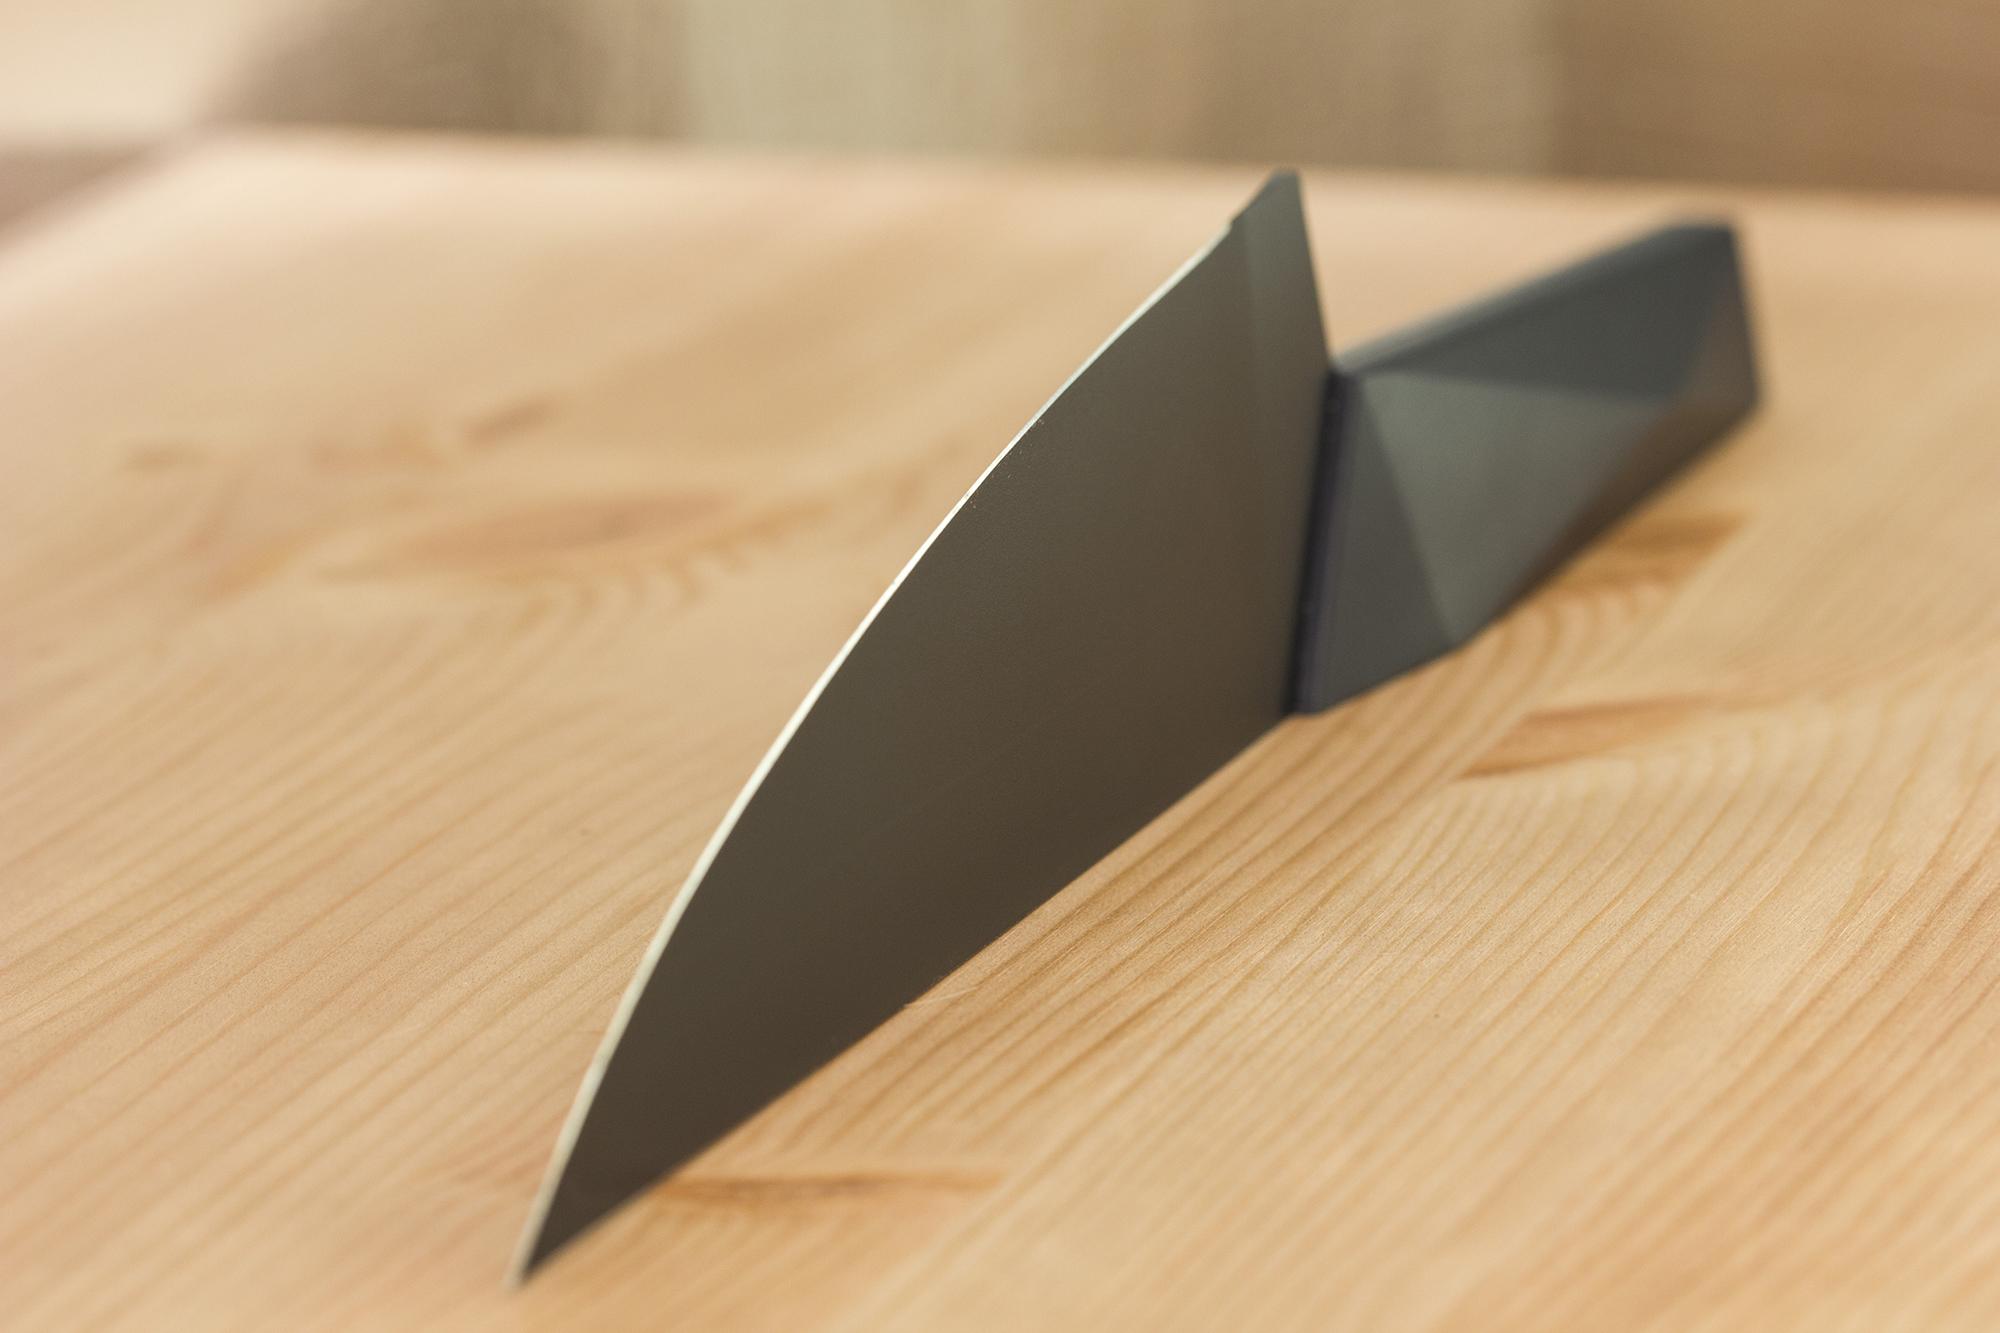 evercut furtif chef s knife review previous magazine evercut furtif chef s knife side profile